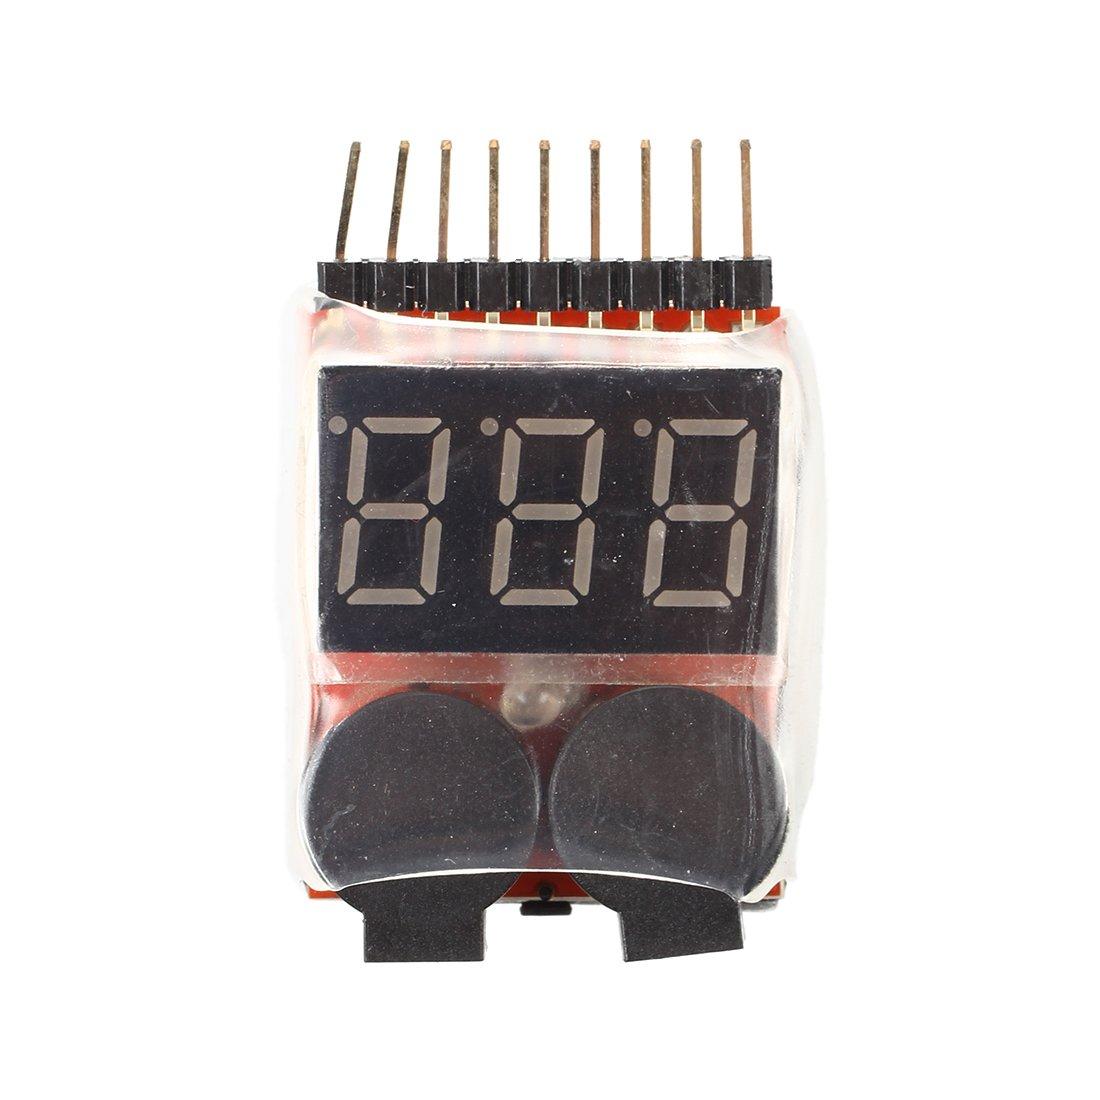 TOOGOO(R) Lipo Battery Voltage Tester 1S-8S link + Low Voltage Buzzer Alarm